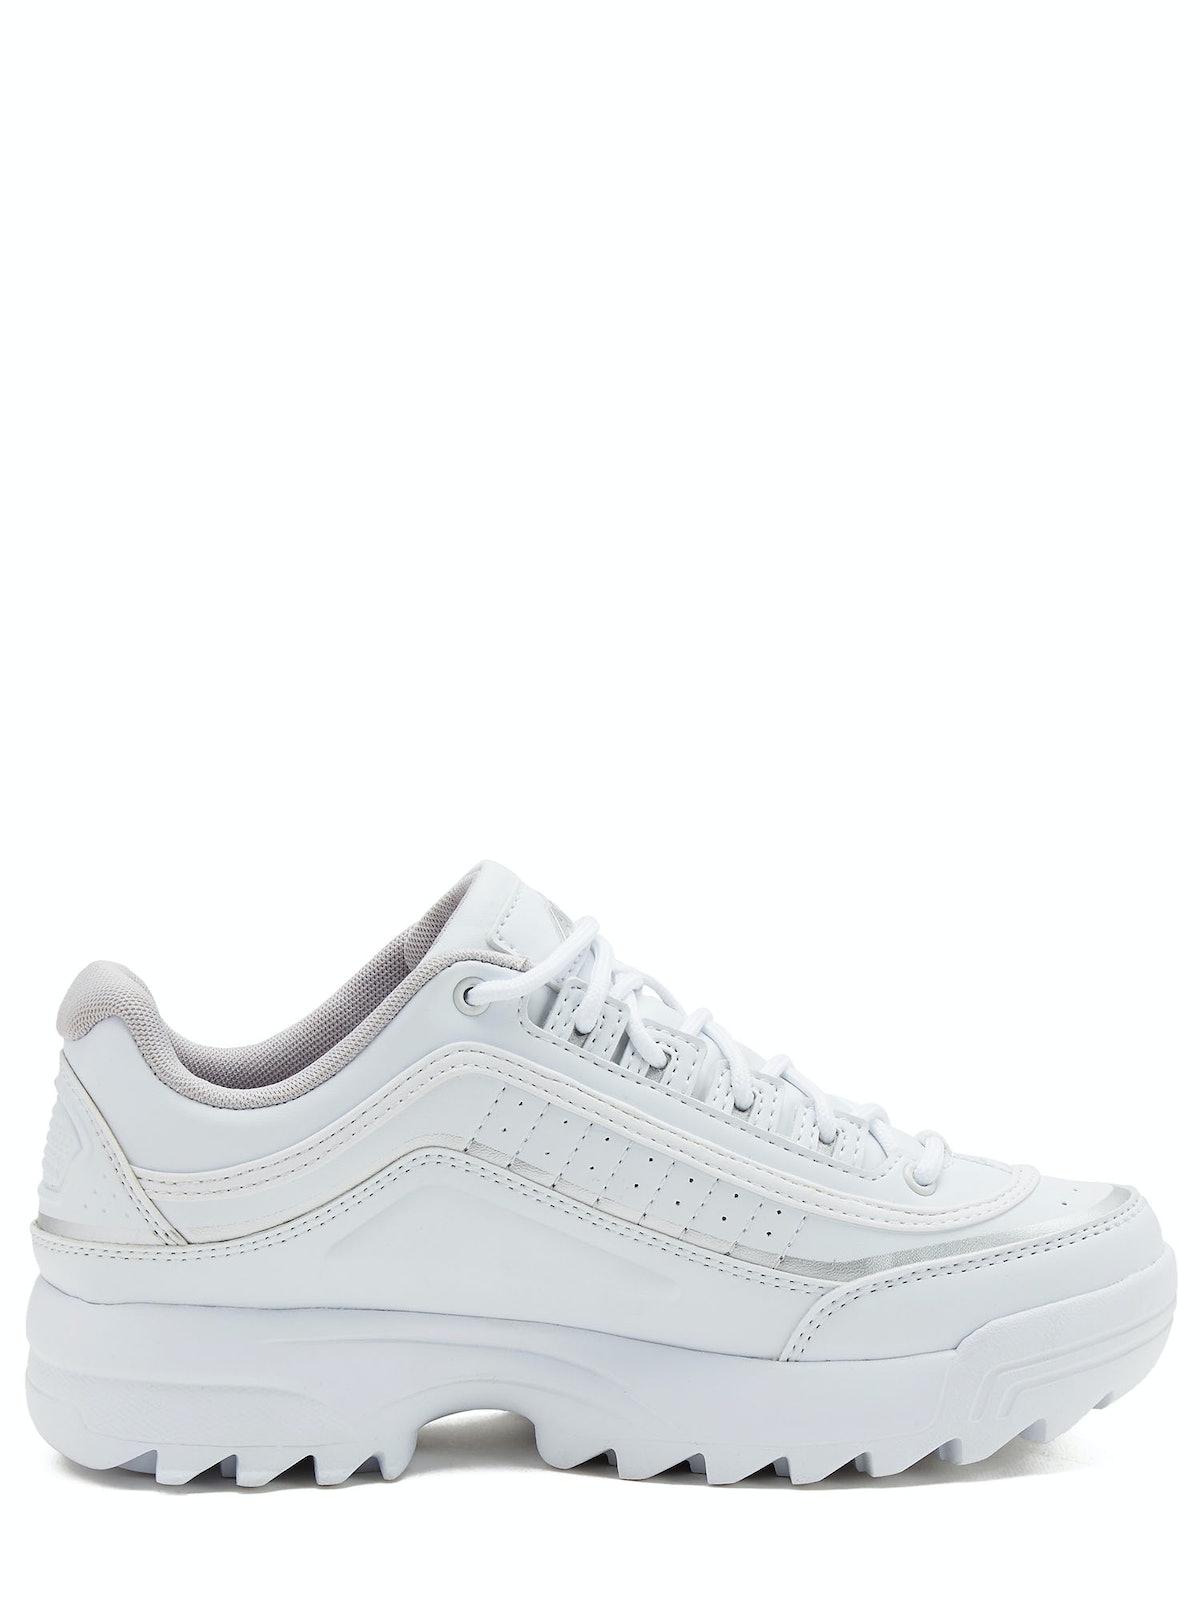 Women's Avia Athletic Sneaker